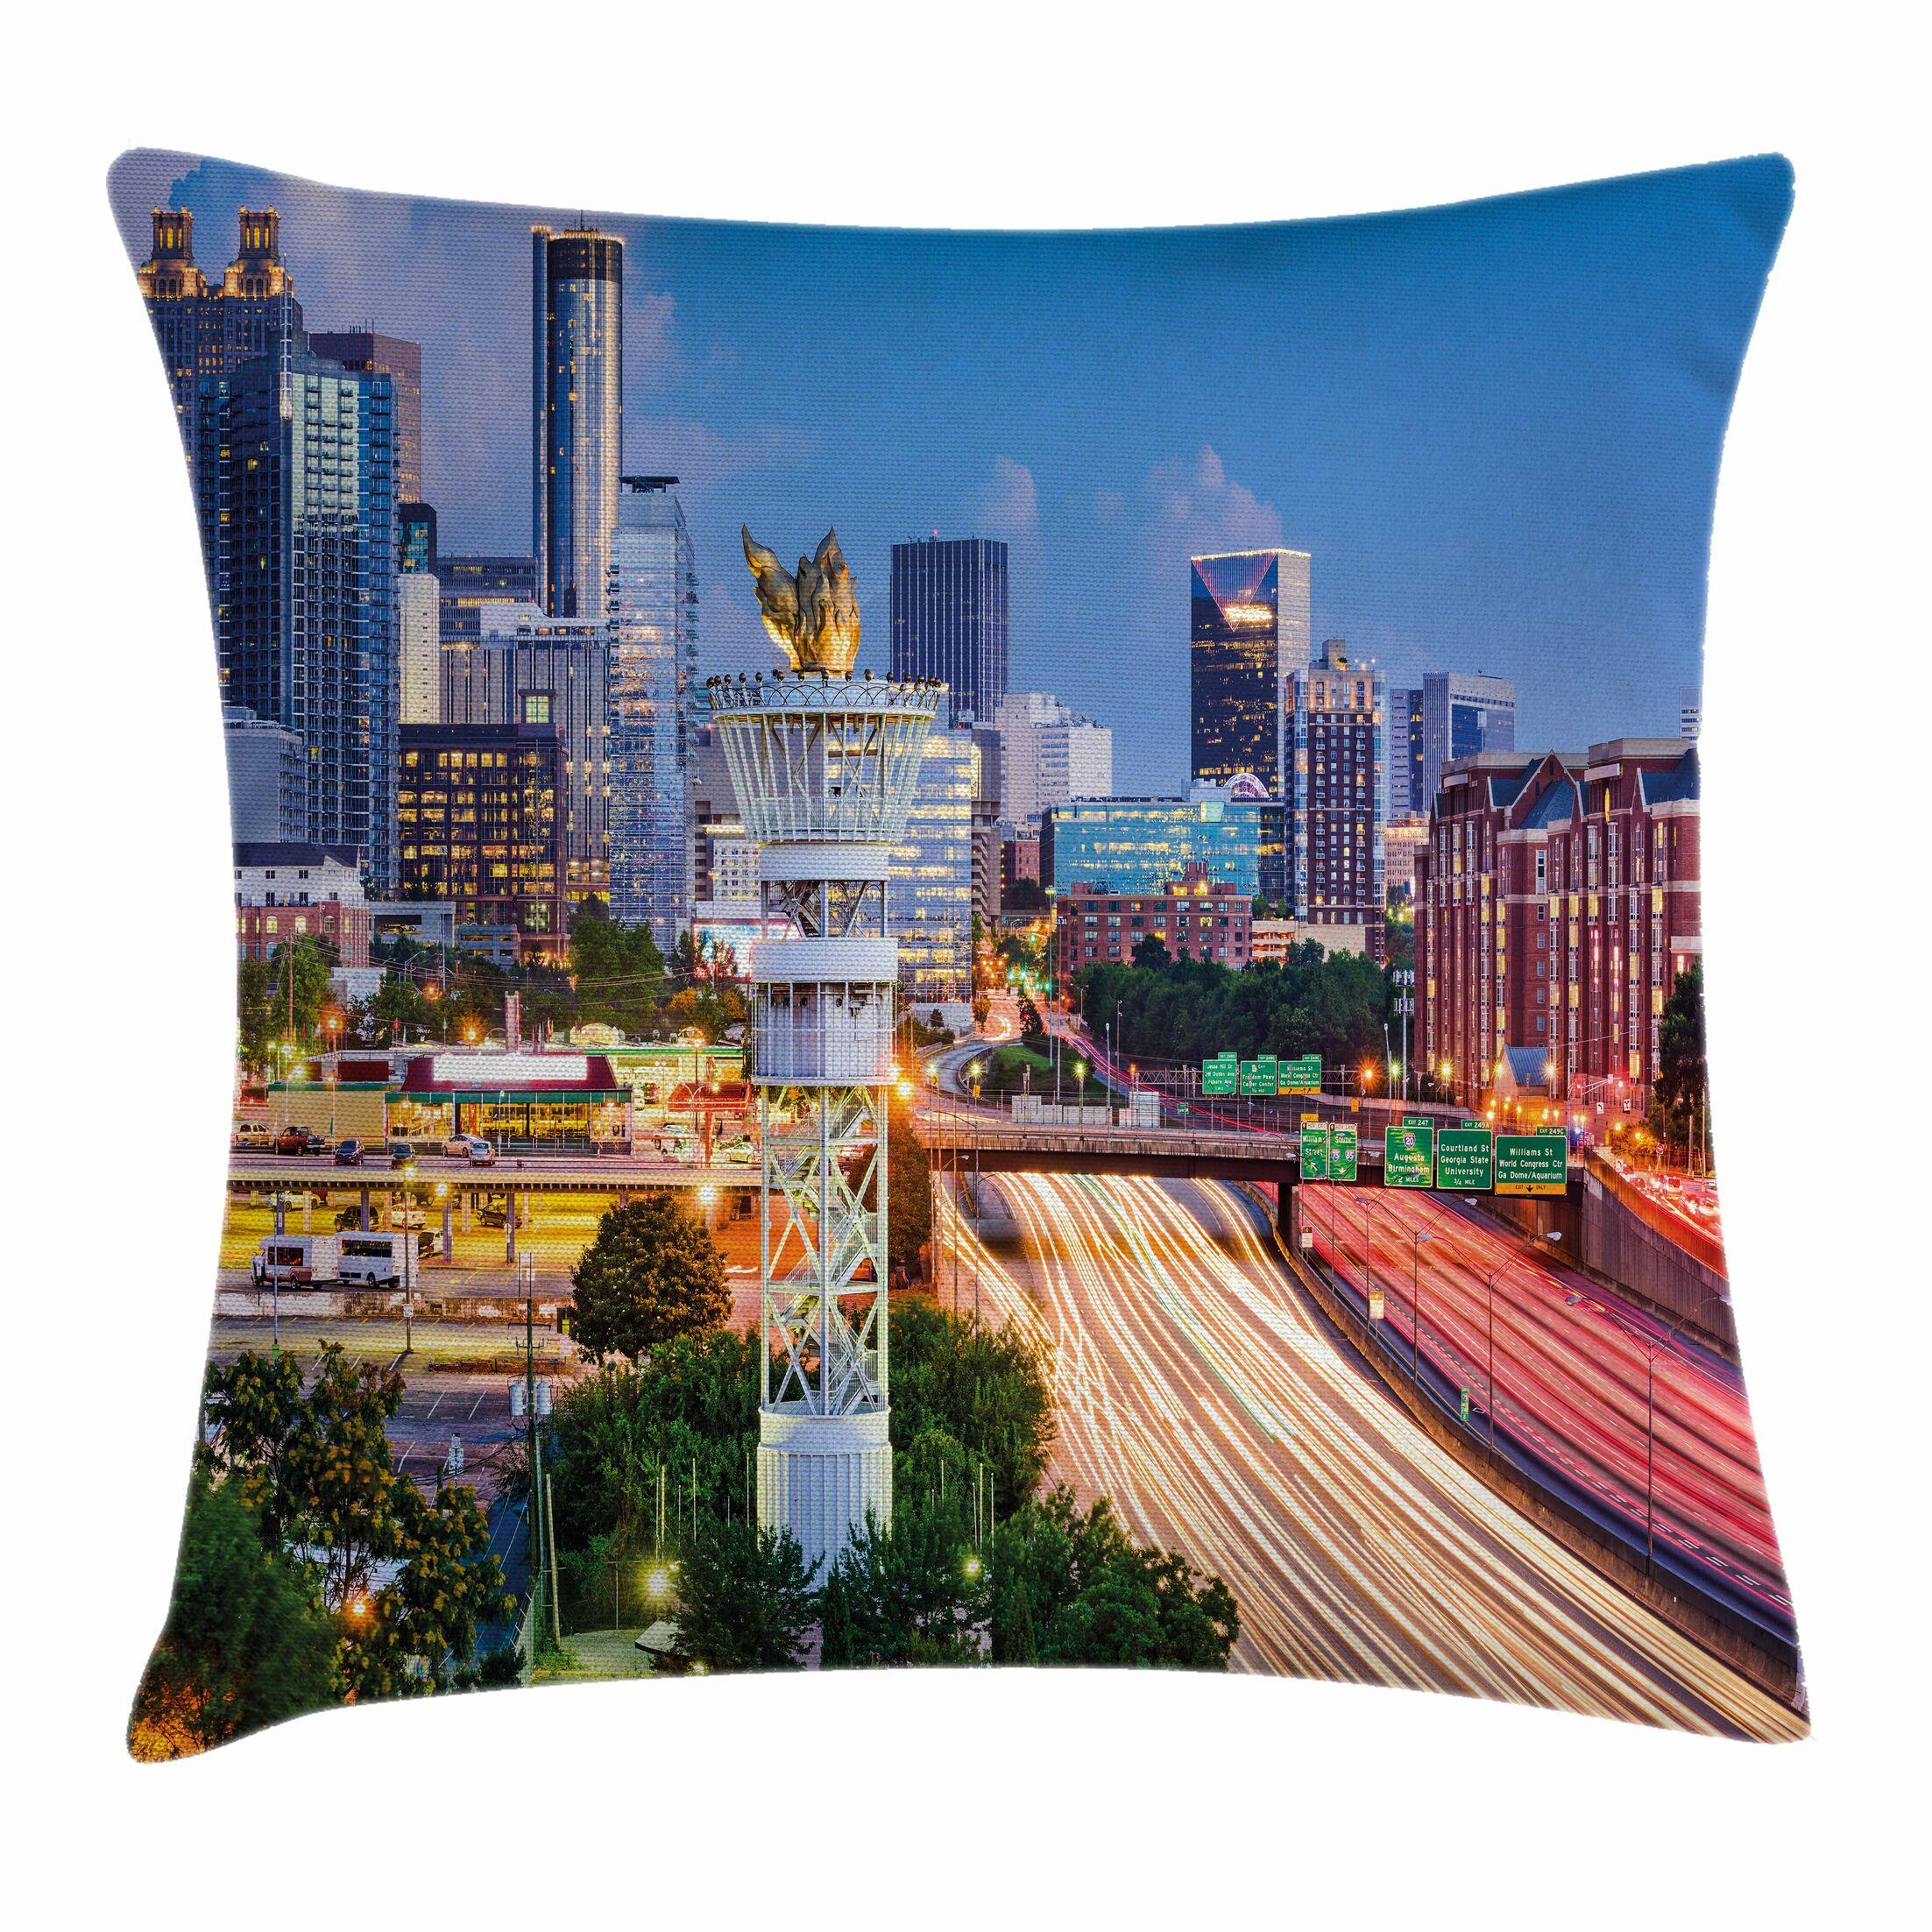 United States Atlanta Georgia Square Pillow Cover Size: 24